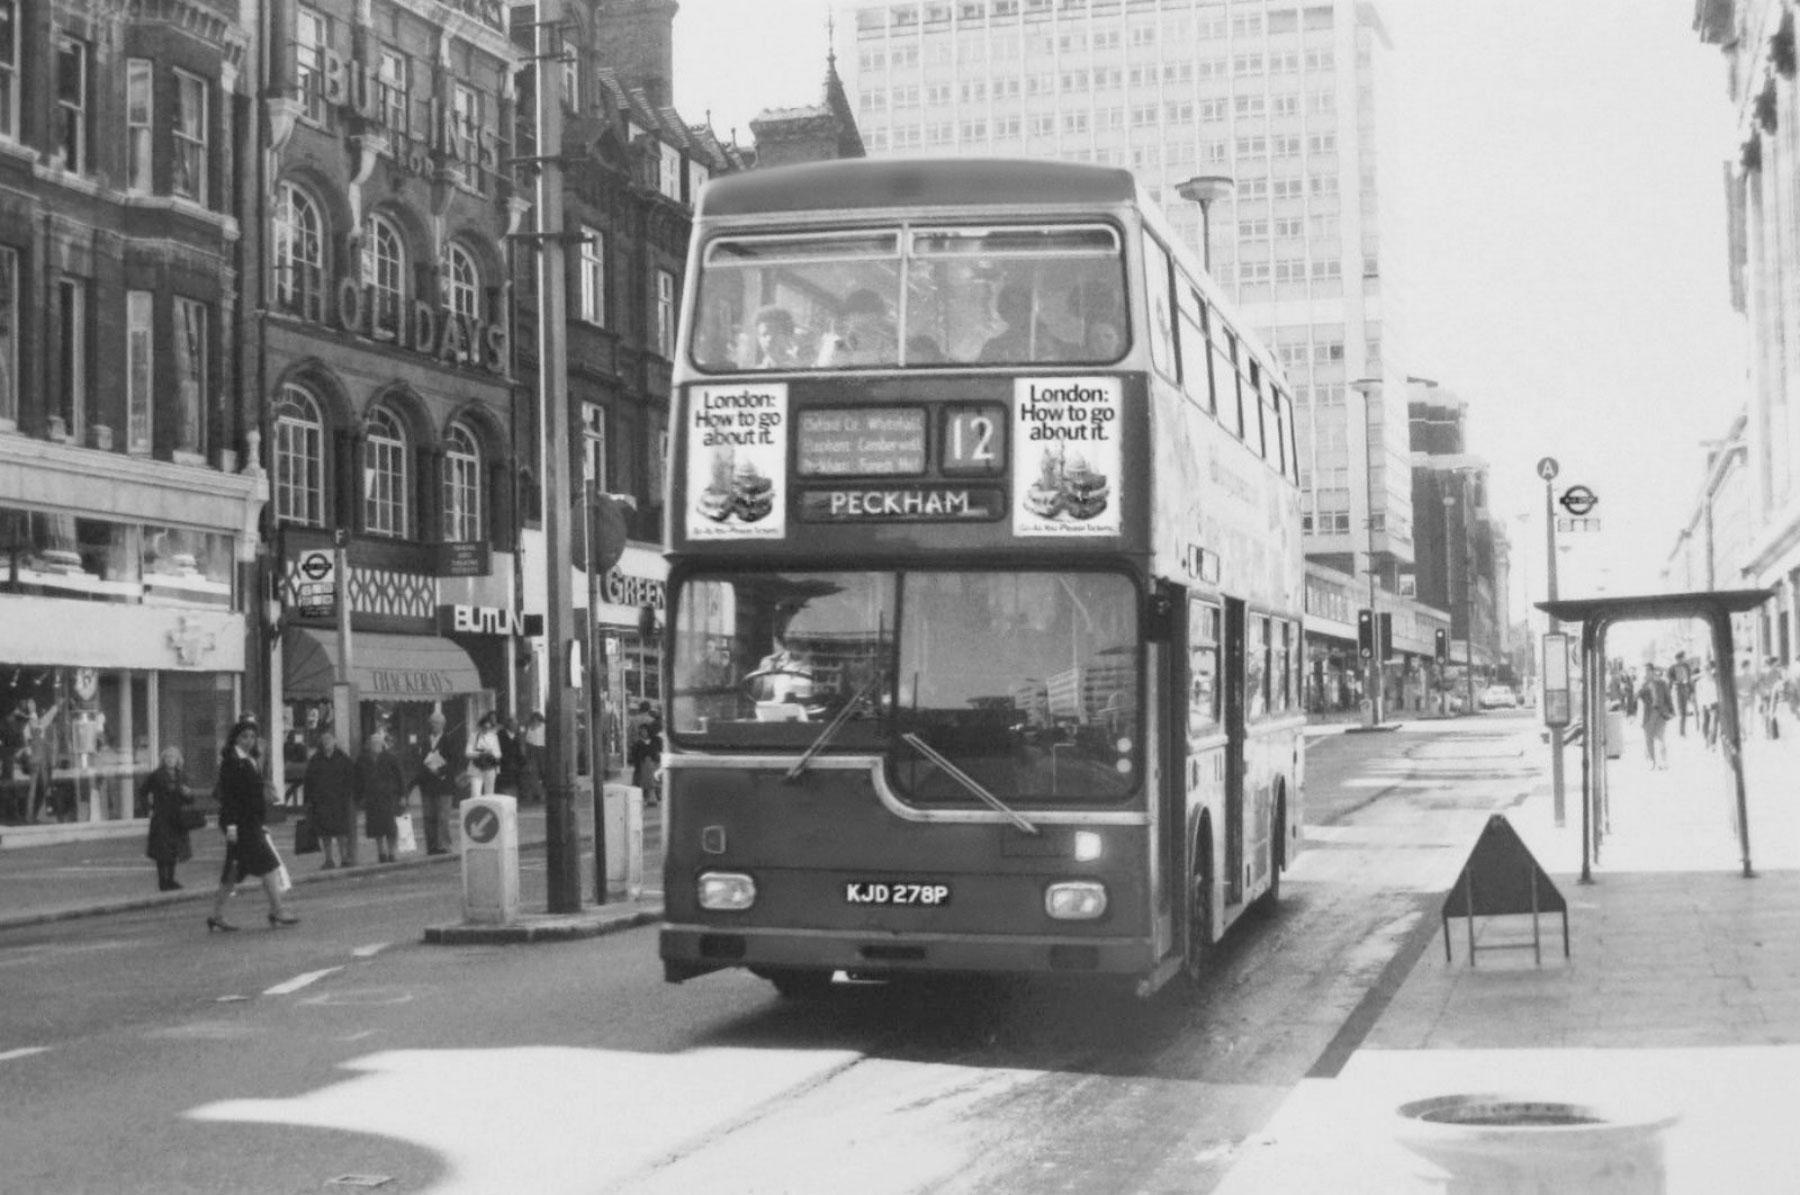 London routemaster bus bound for Peckham, black and white street scene